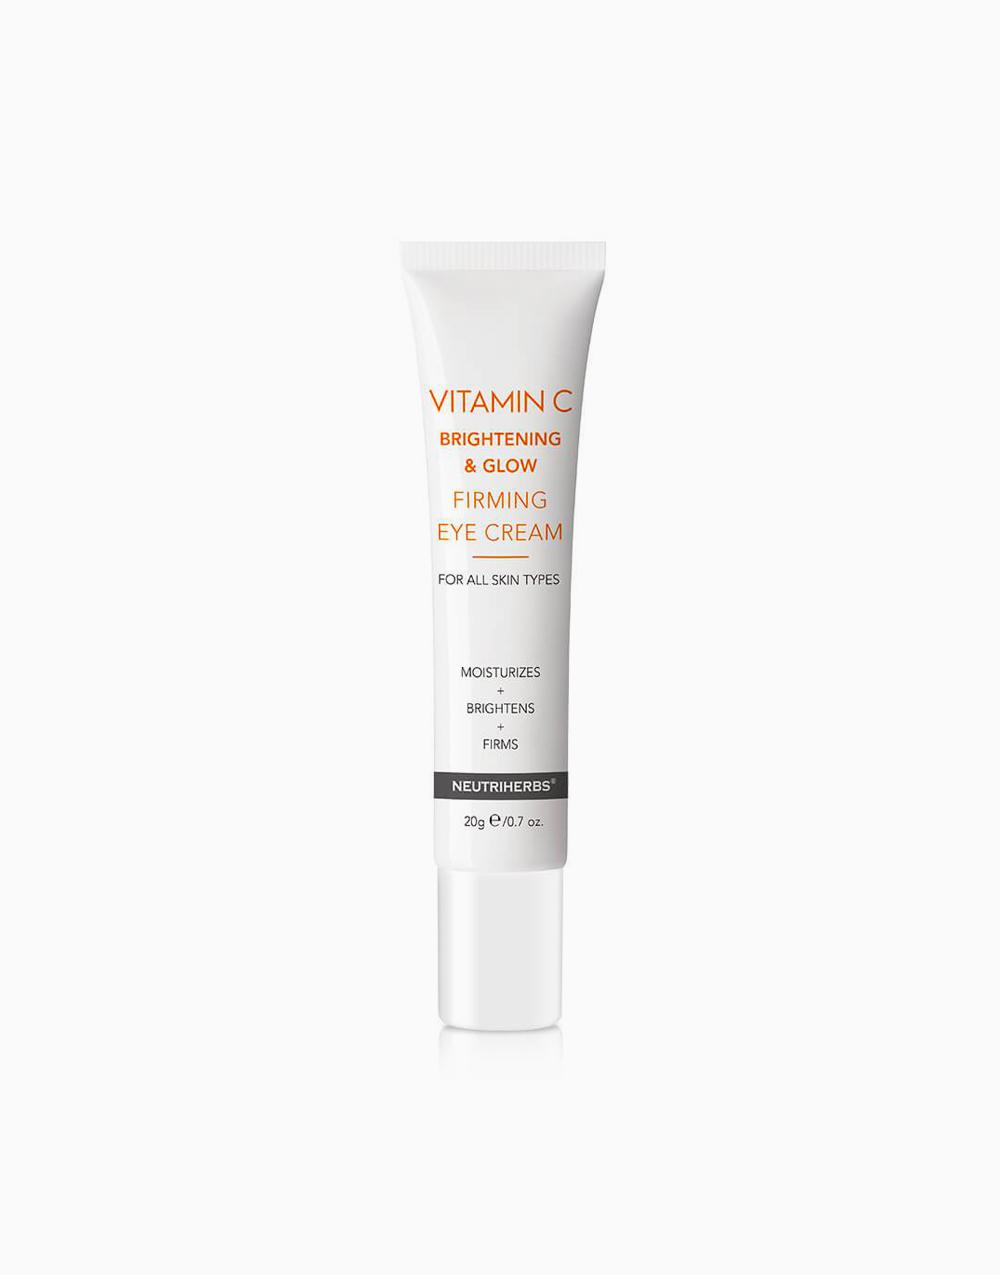 Vitamin C Brightening & Glow Firming Eye Cream by Neutriherbs